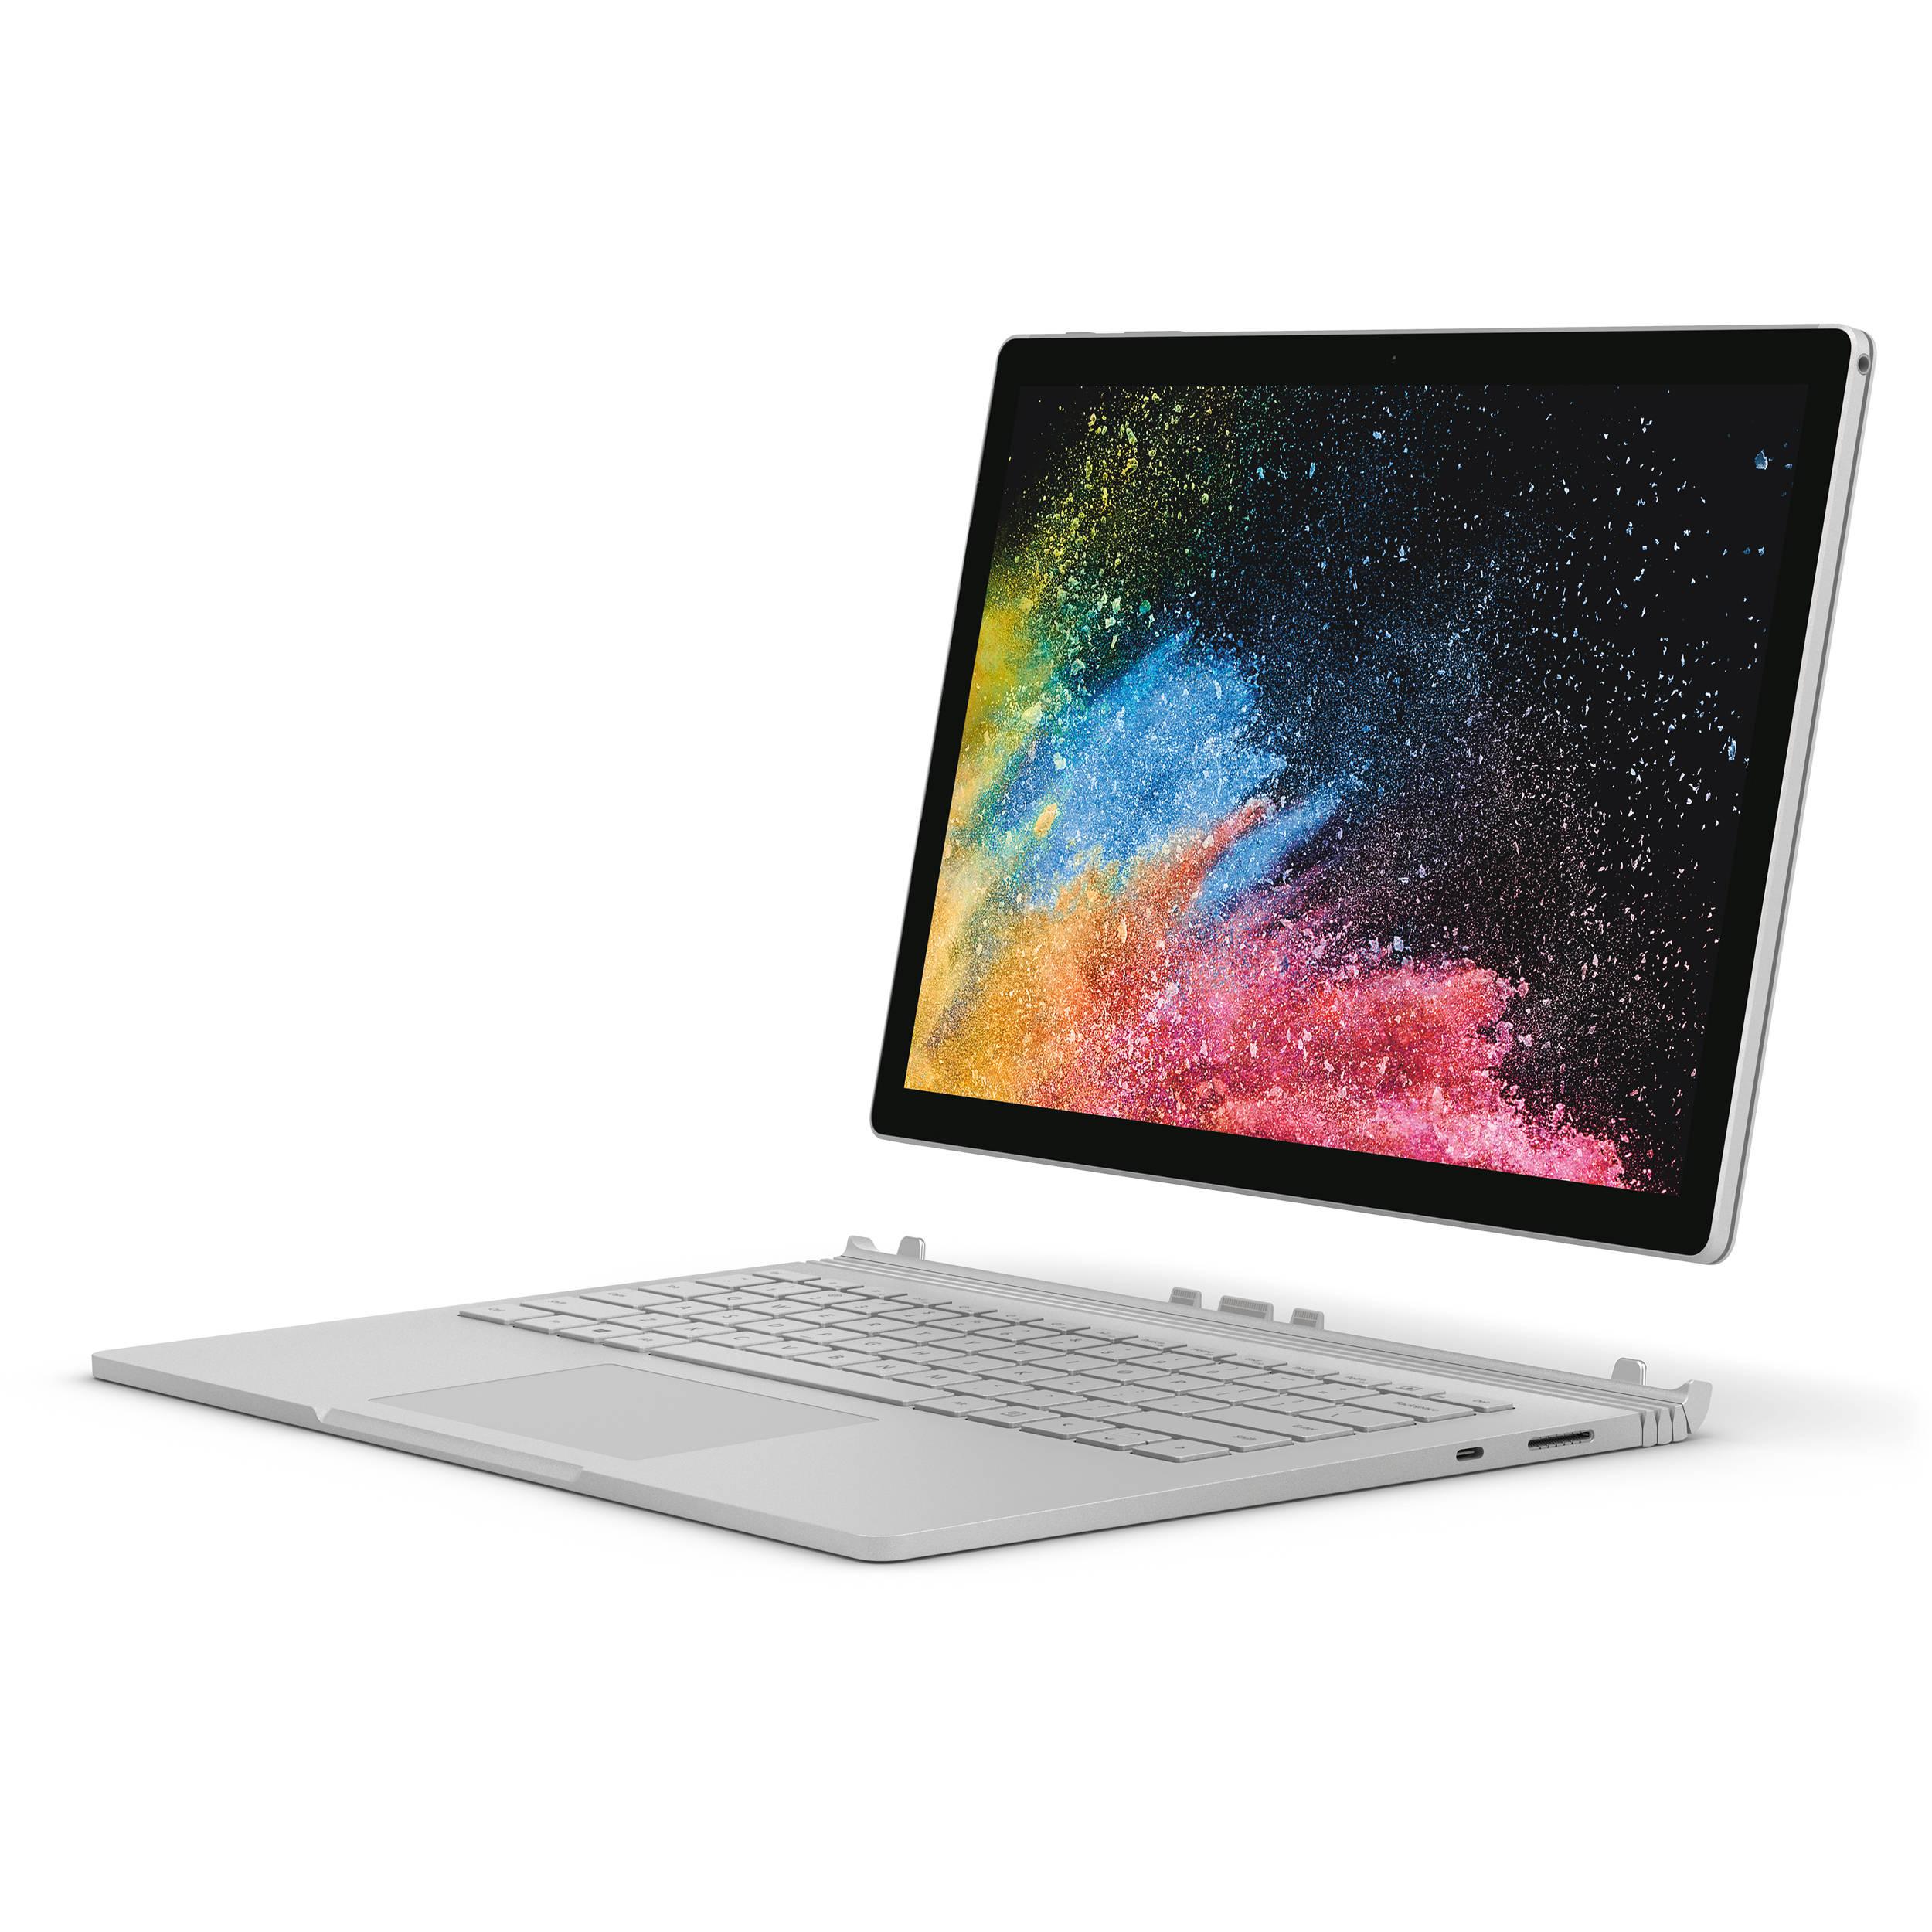 2 In 1 Laptops B H Photo Video